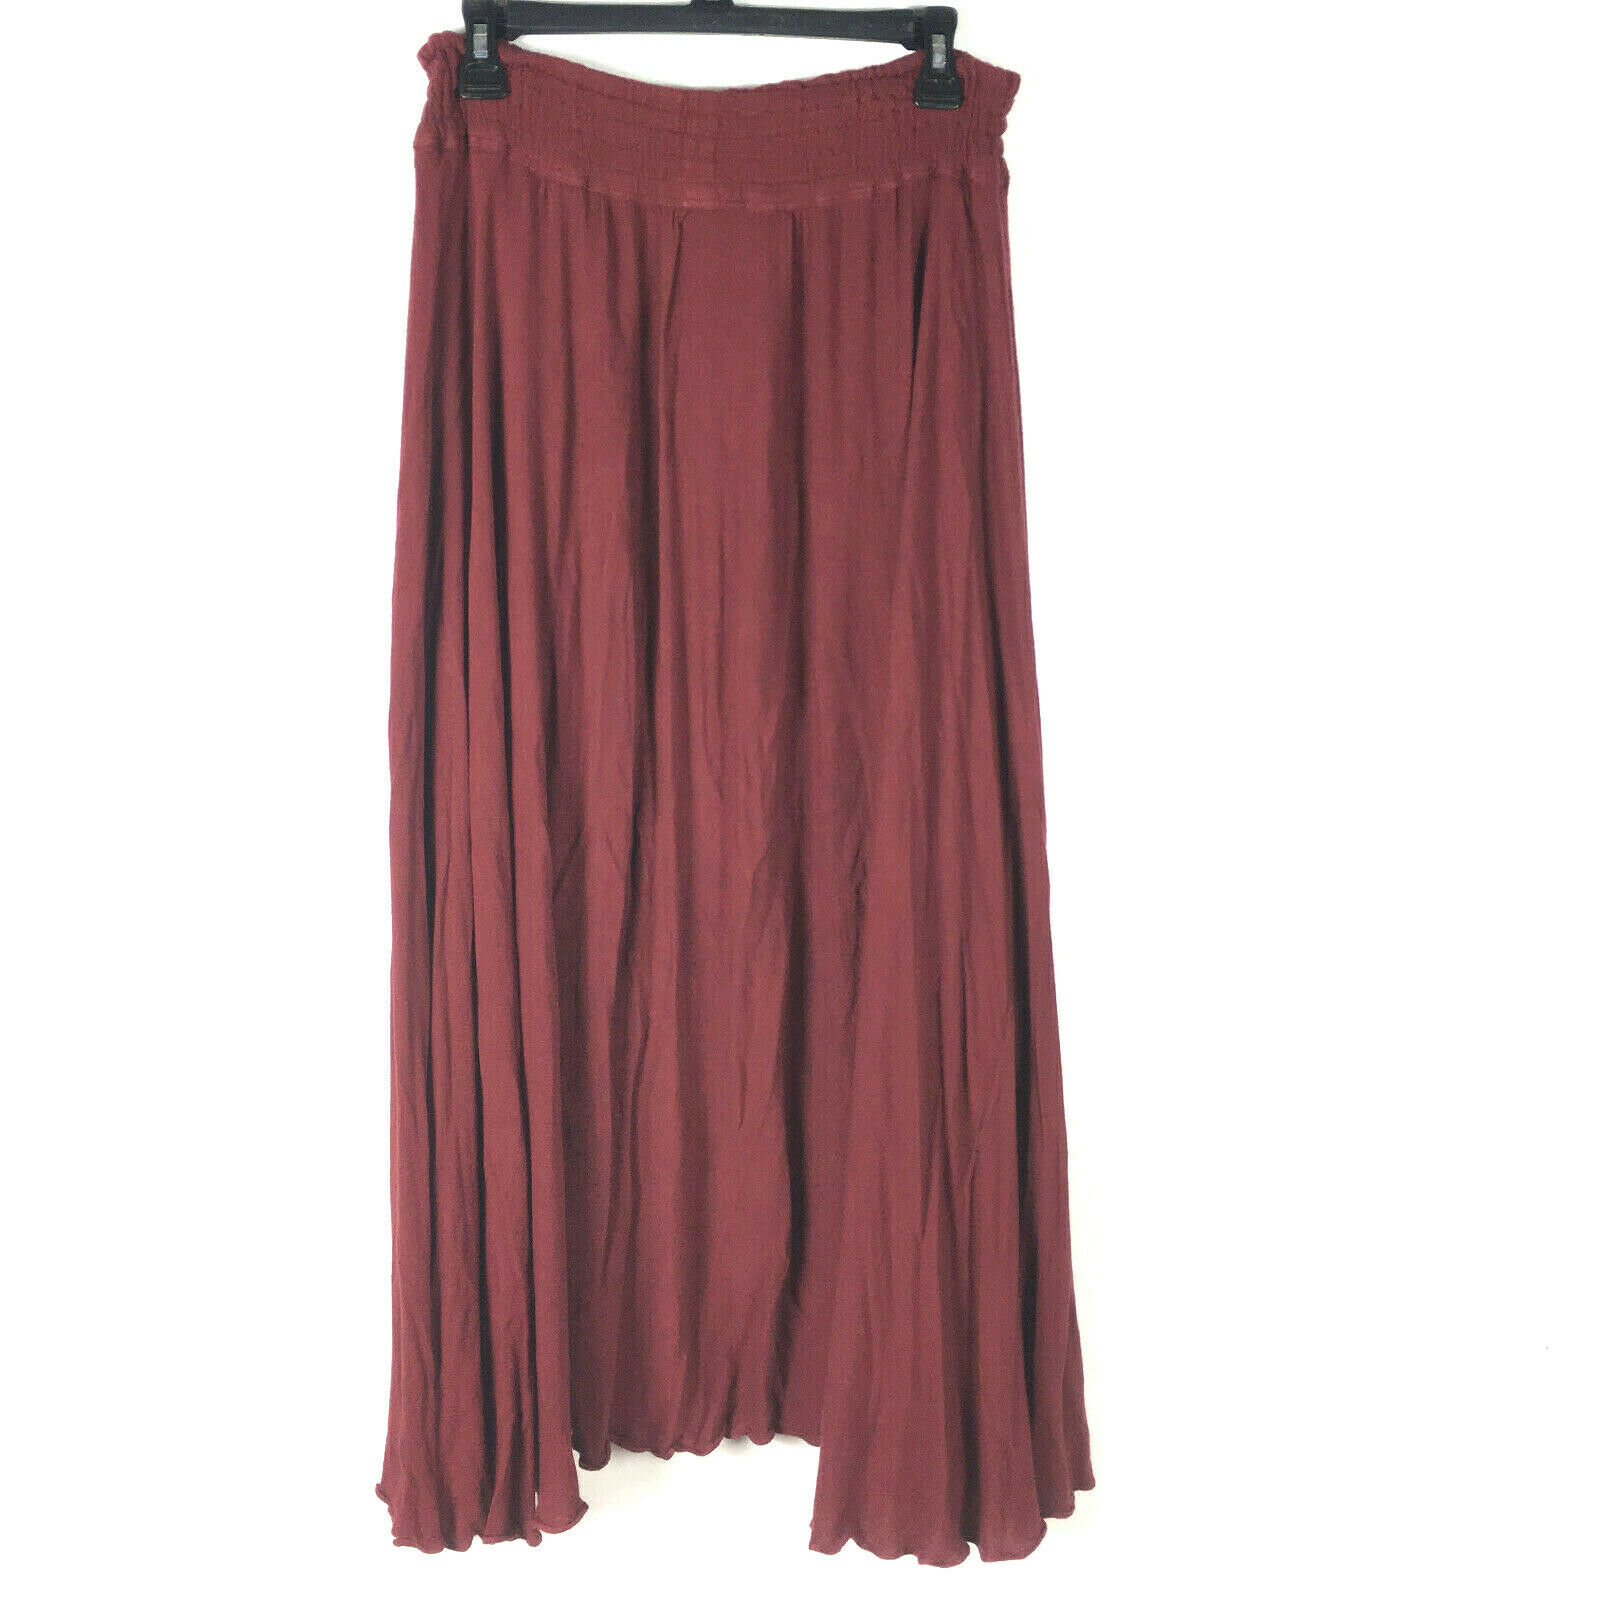 Laise Adzer Skirt Women's Small Medium Large Lage… - image 4